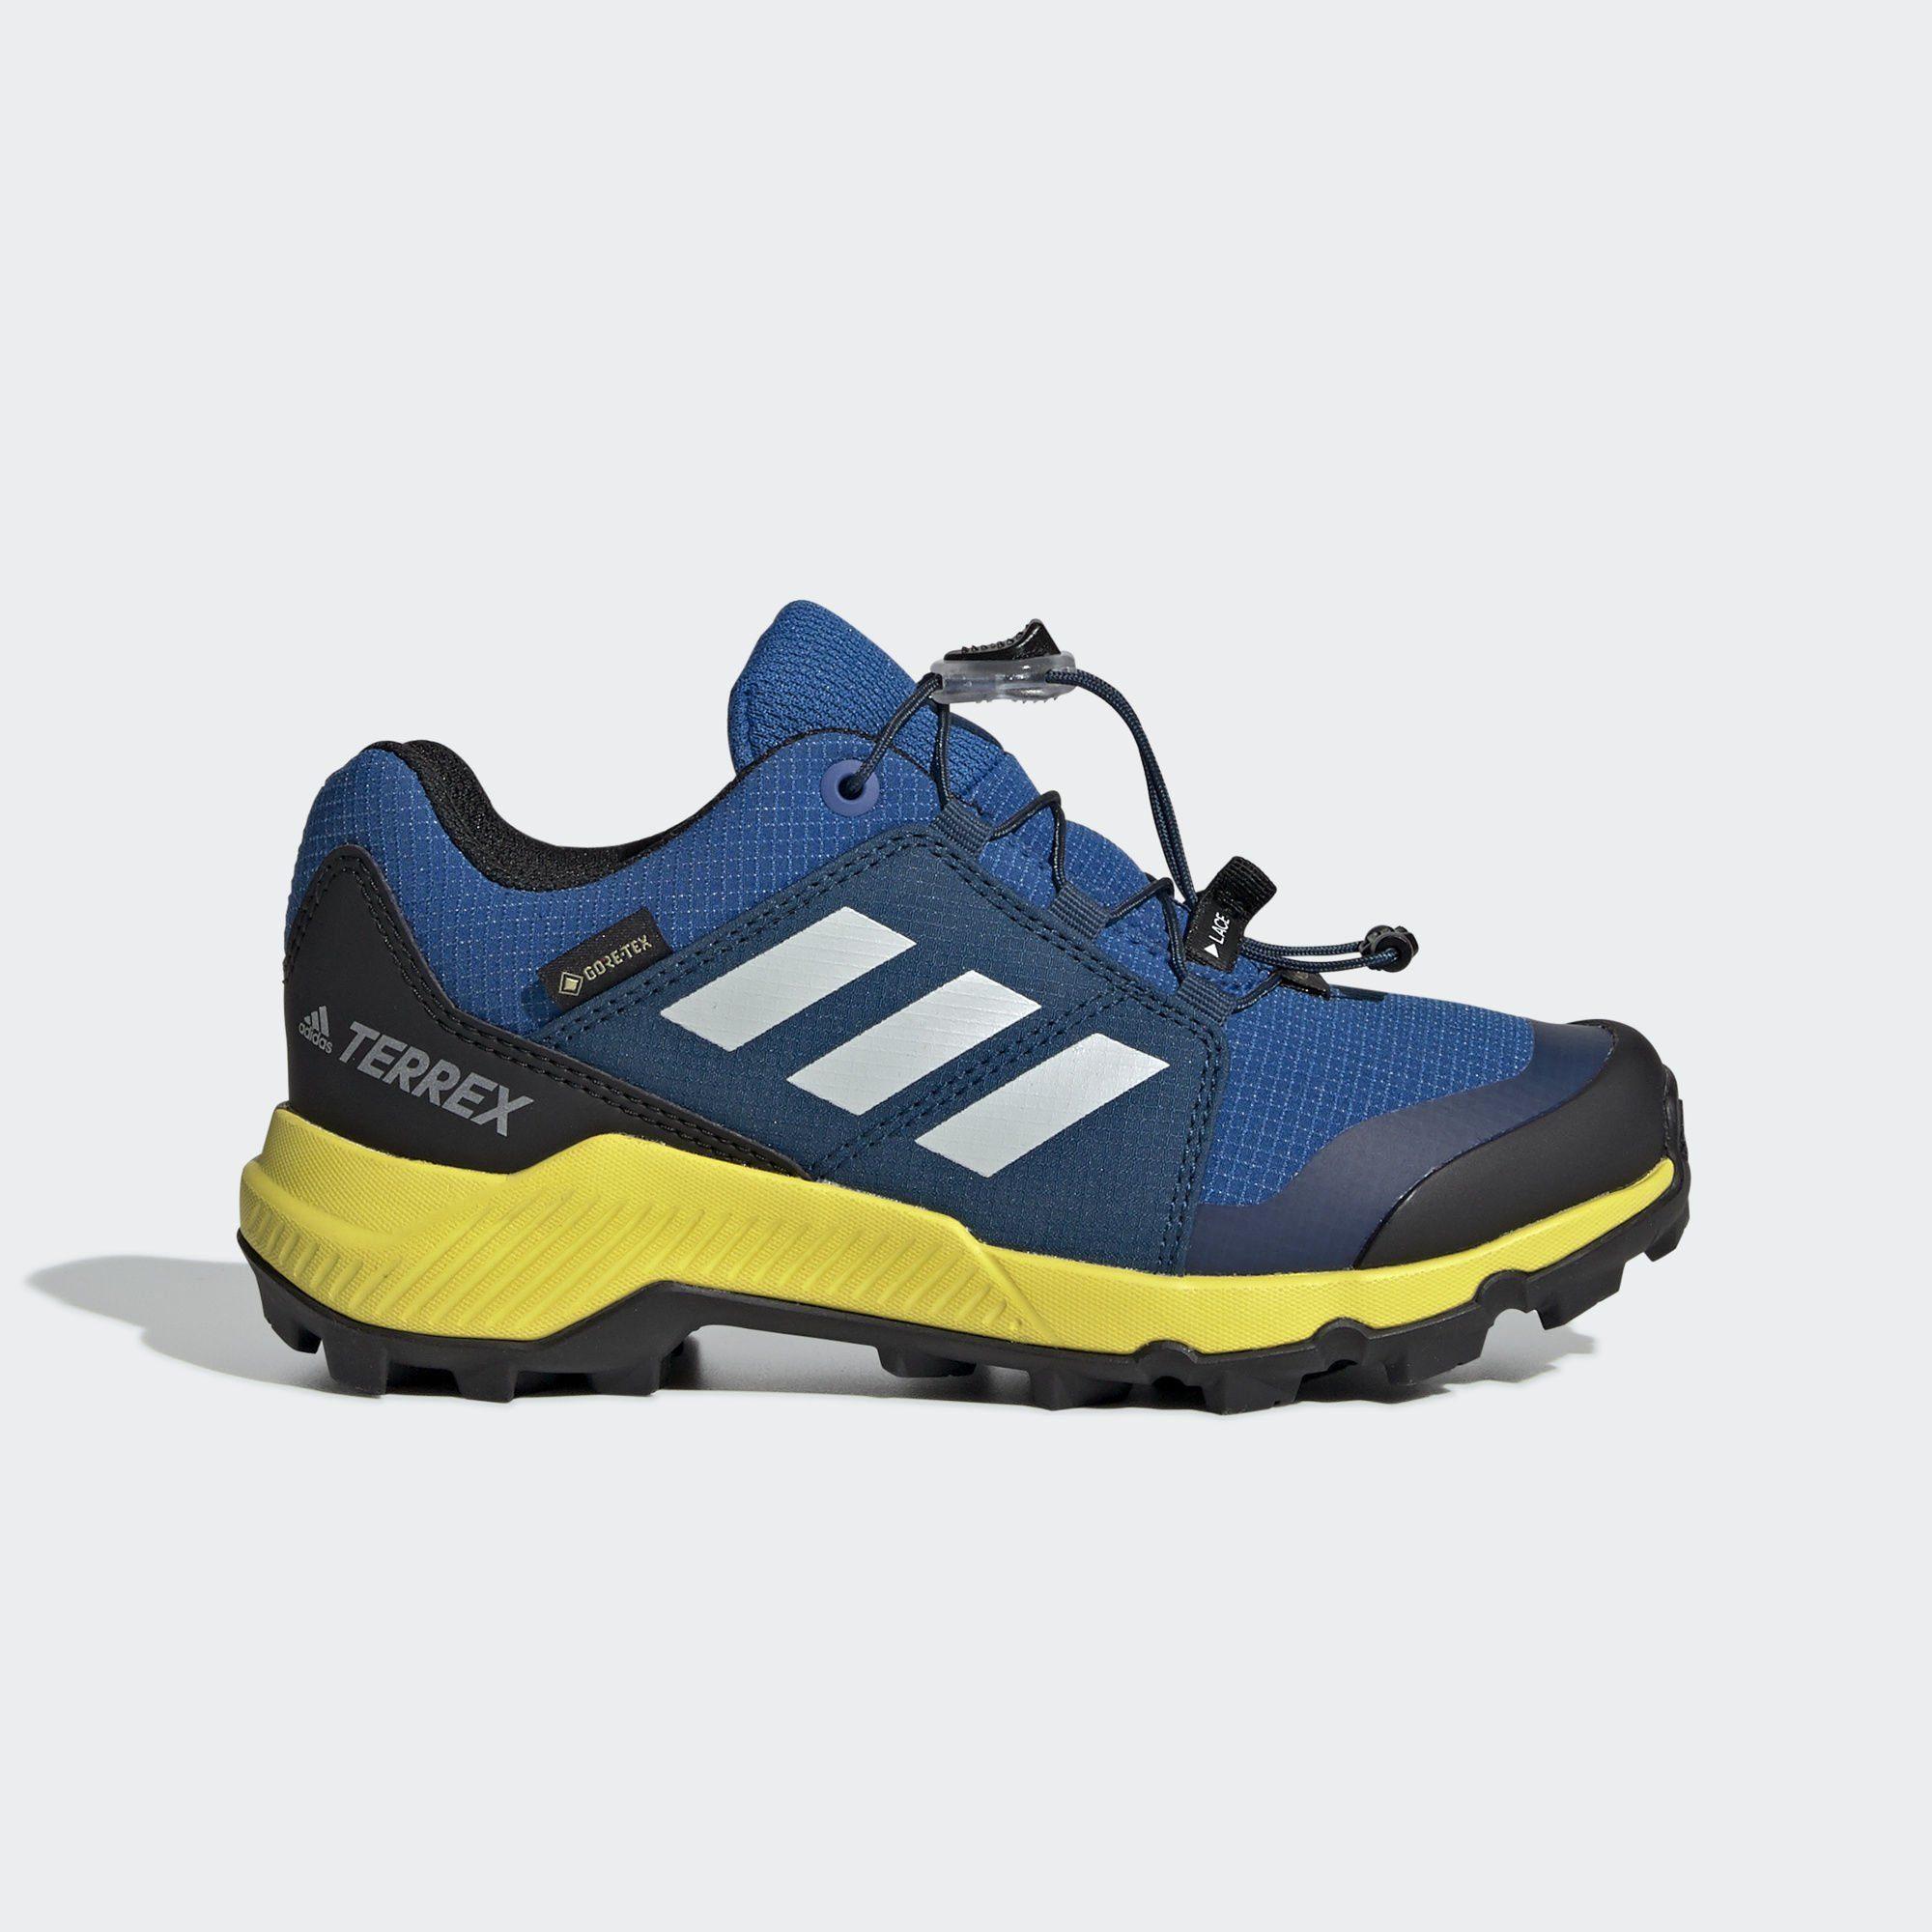 adidas Performance »TERREX GTX Schuh« Outdoorschuh Outdoorschuh online kaufen | OTTO